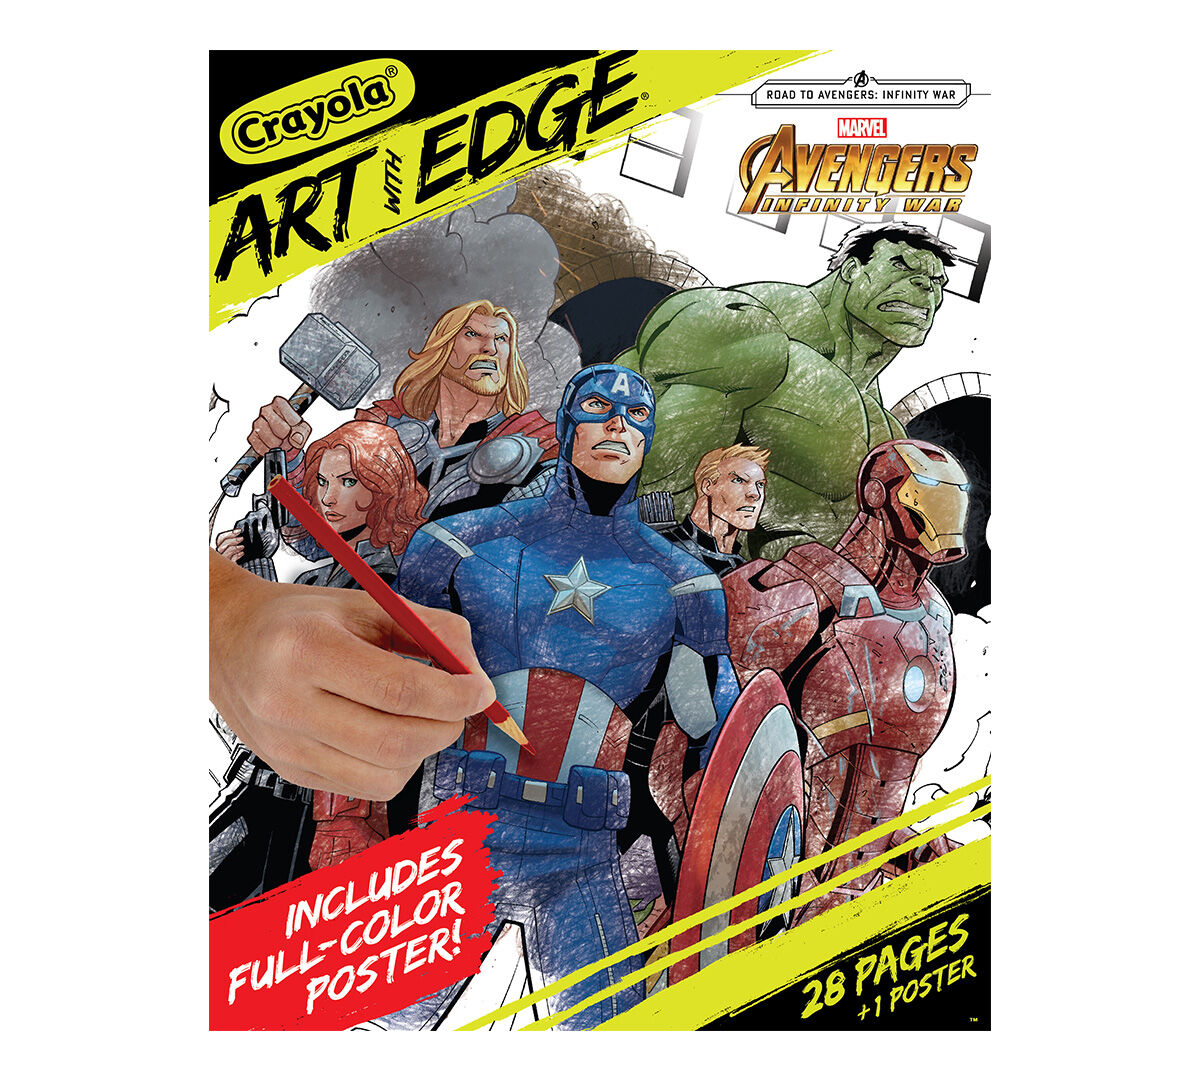 Crayola Art With Edge Marvel Avengers